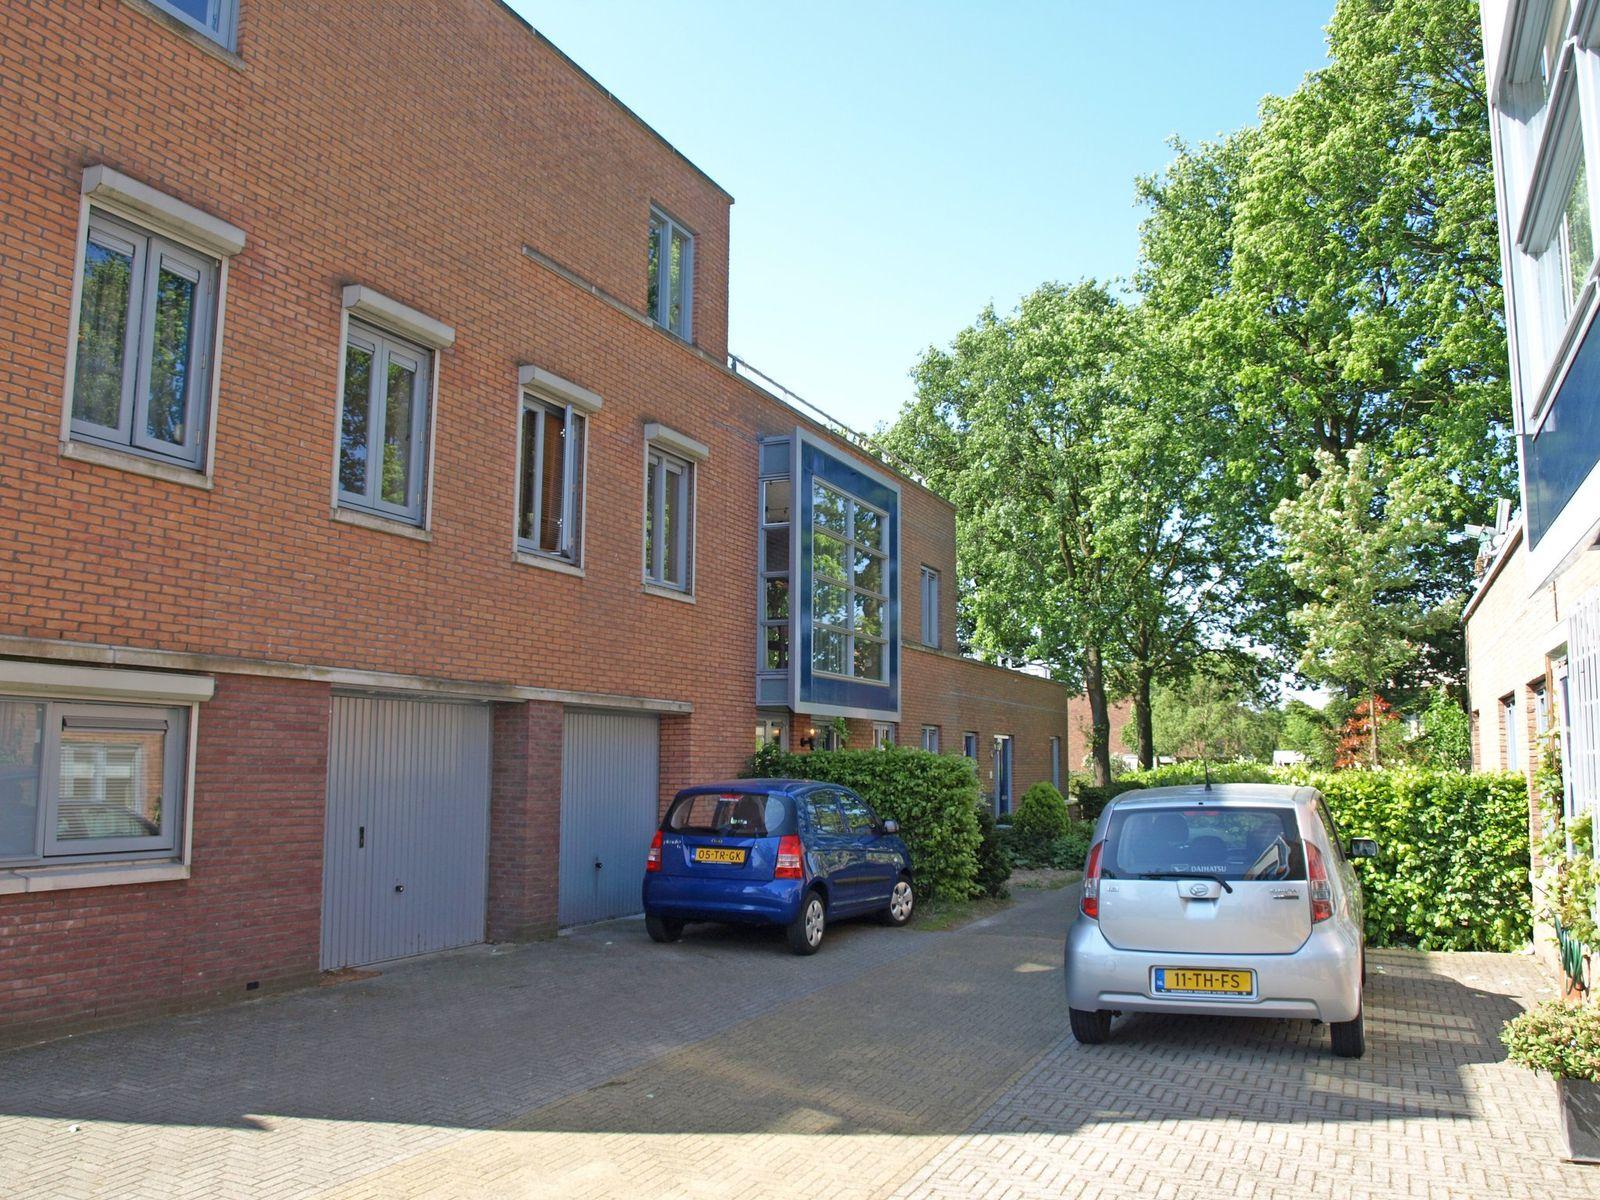 Johan Wensinkstraat 44, Deventer